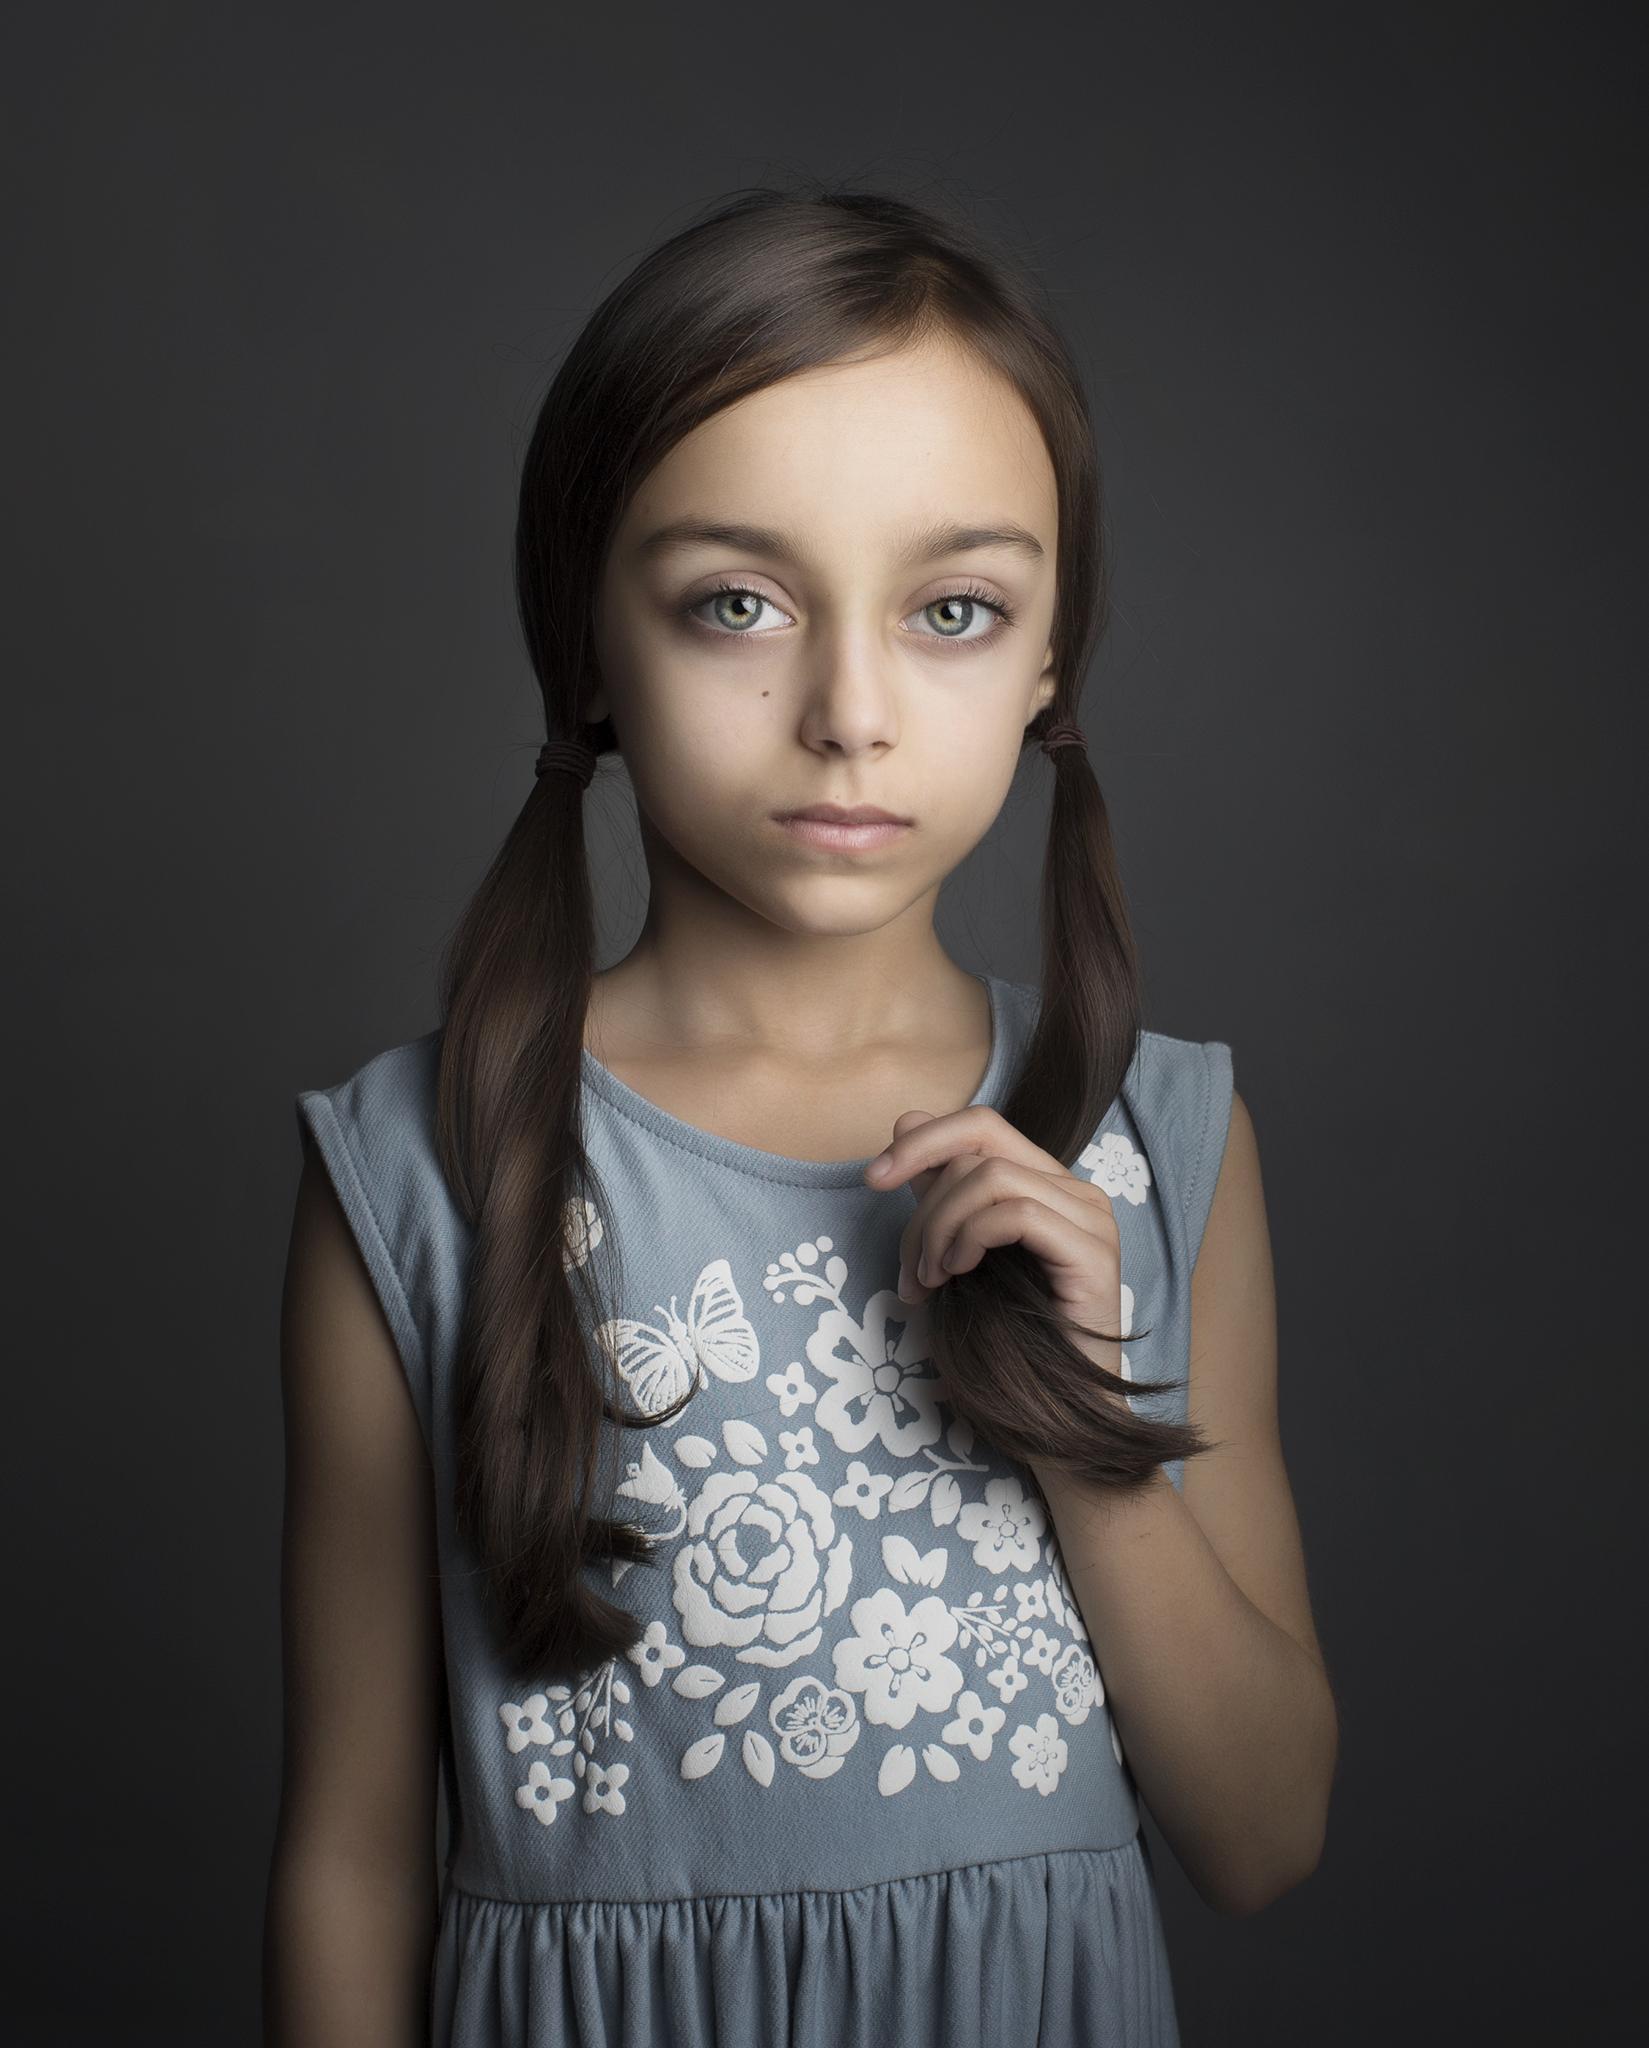 elizabethg_photography_hertfordshire_fineart_child_portrait_model_sophia_tailor_2.jpg